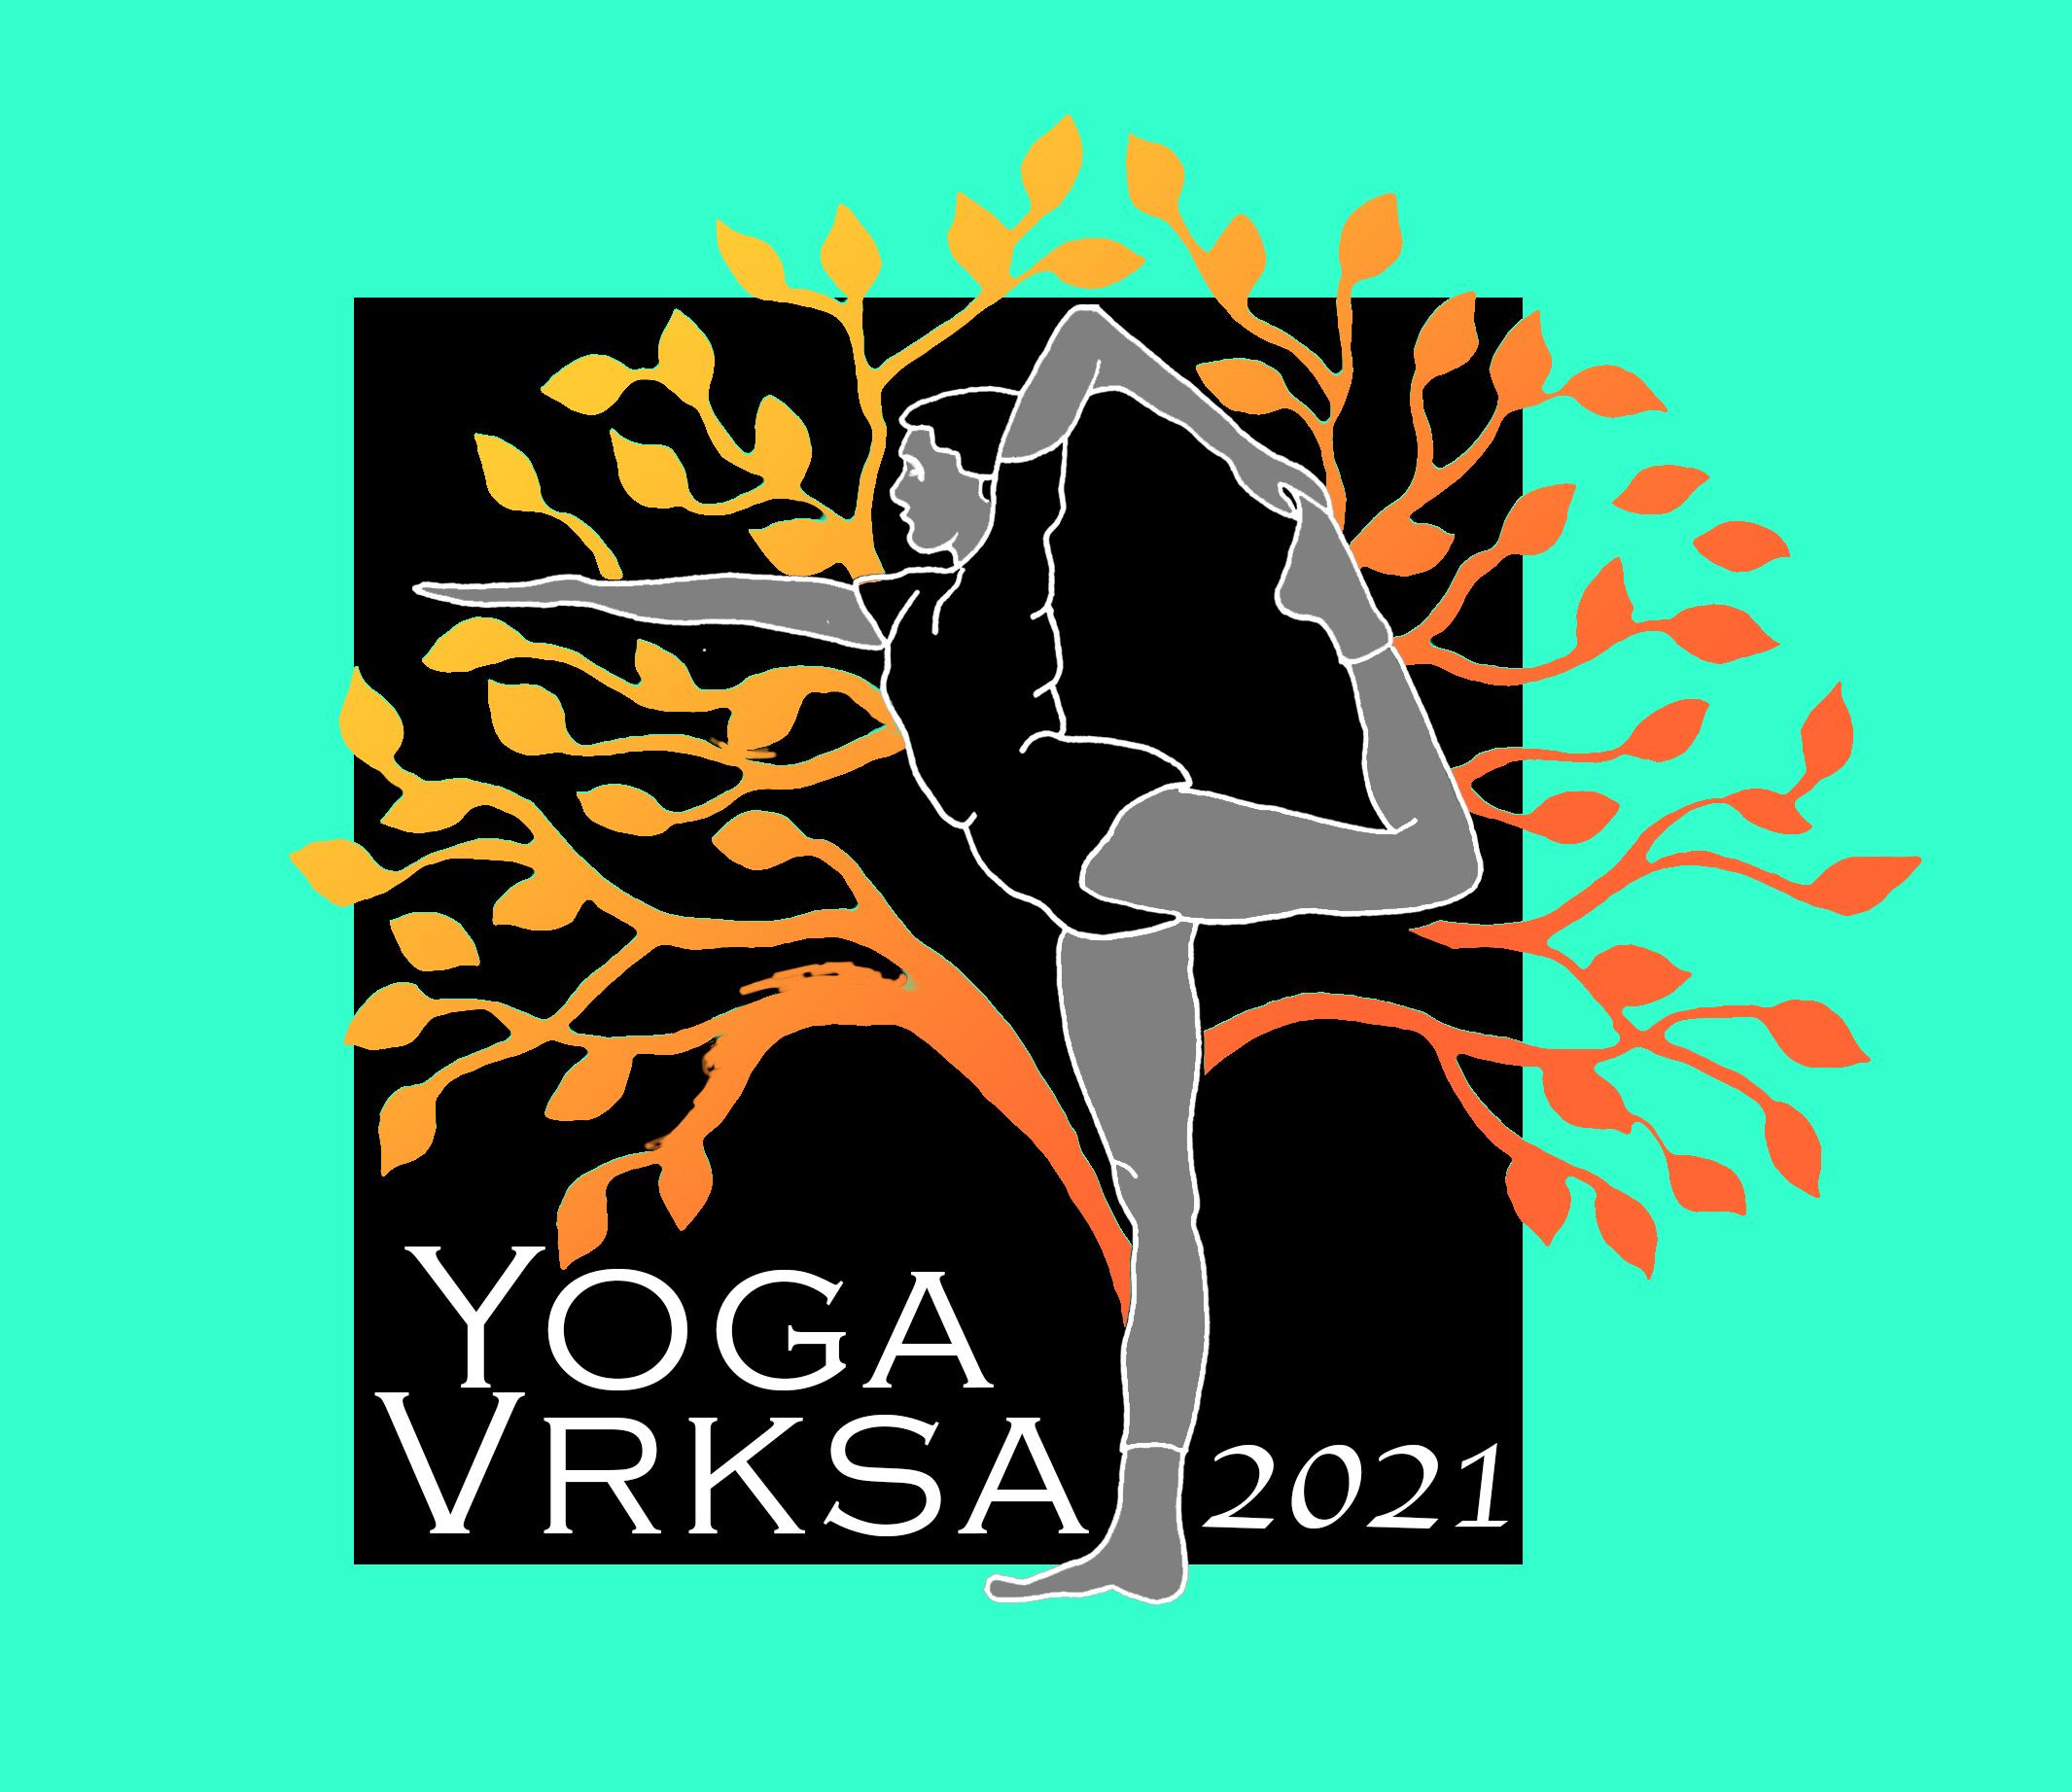 Yoga Vrksa Fall Immersion: Exploring the Art of Integration